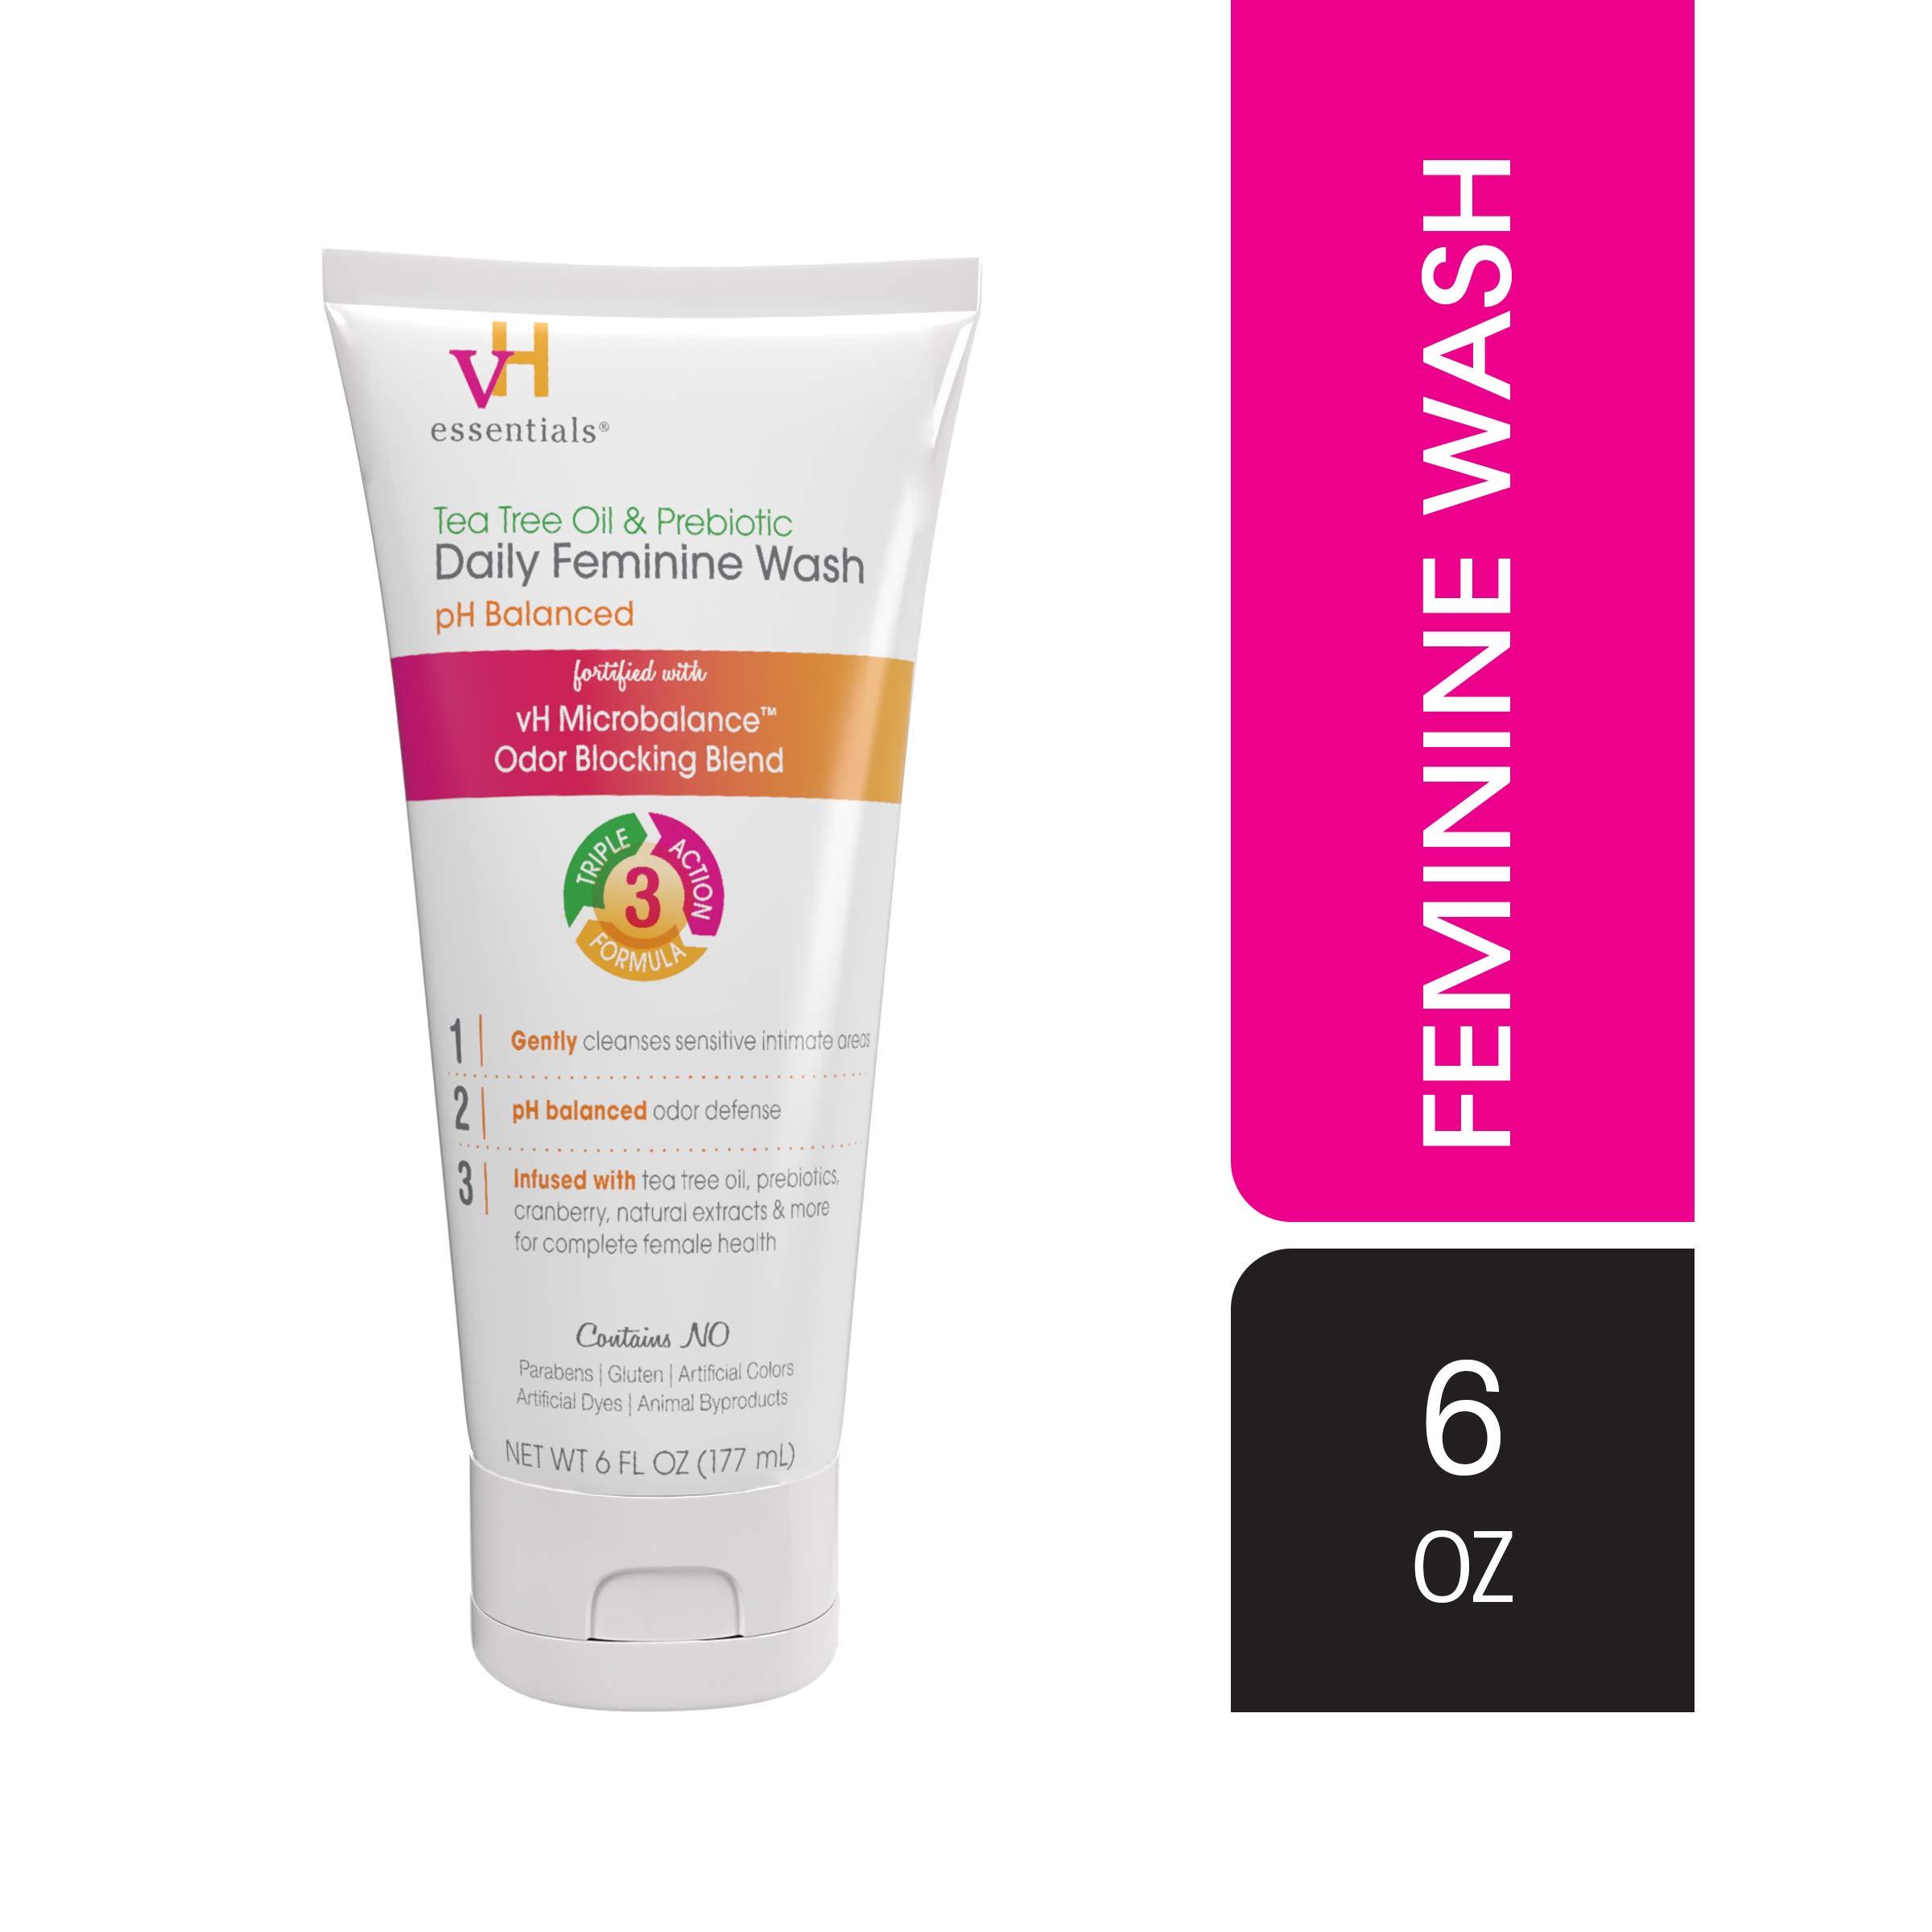 vH essentials, Ph Balanced Daily Feminine Wash, Tea Tree Oil & Prebiotic, 6, Fl Oz, (Pack Of 1)